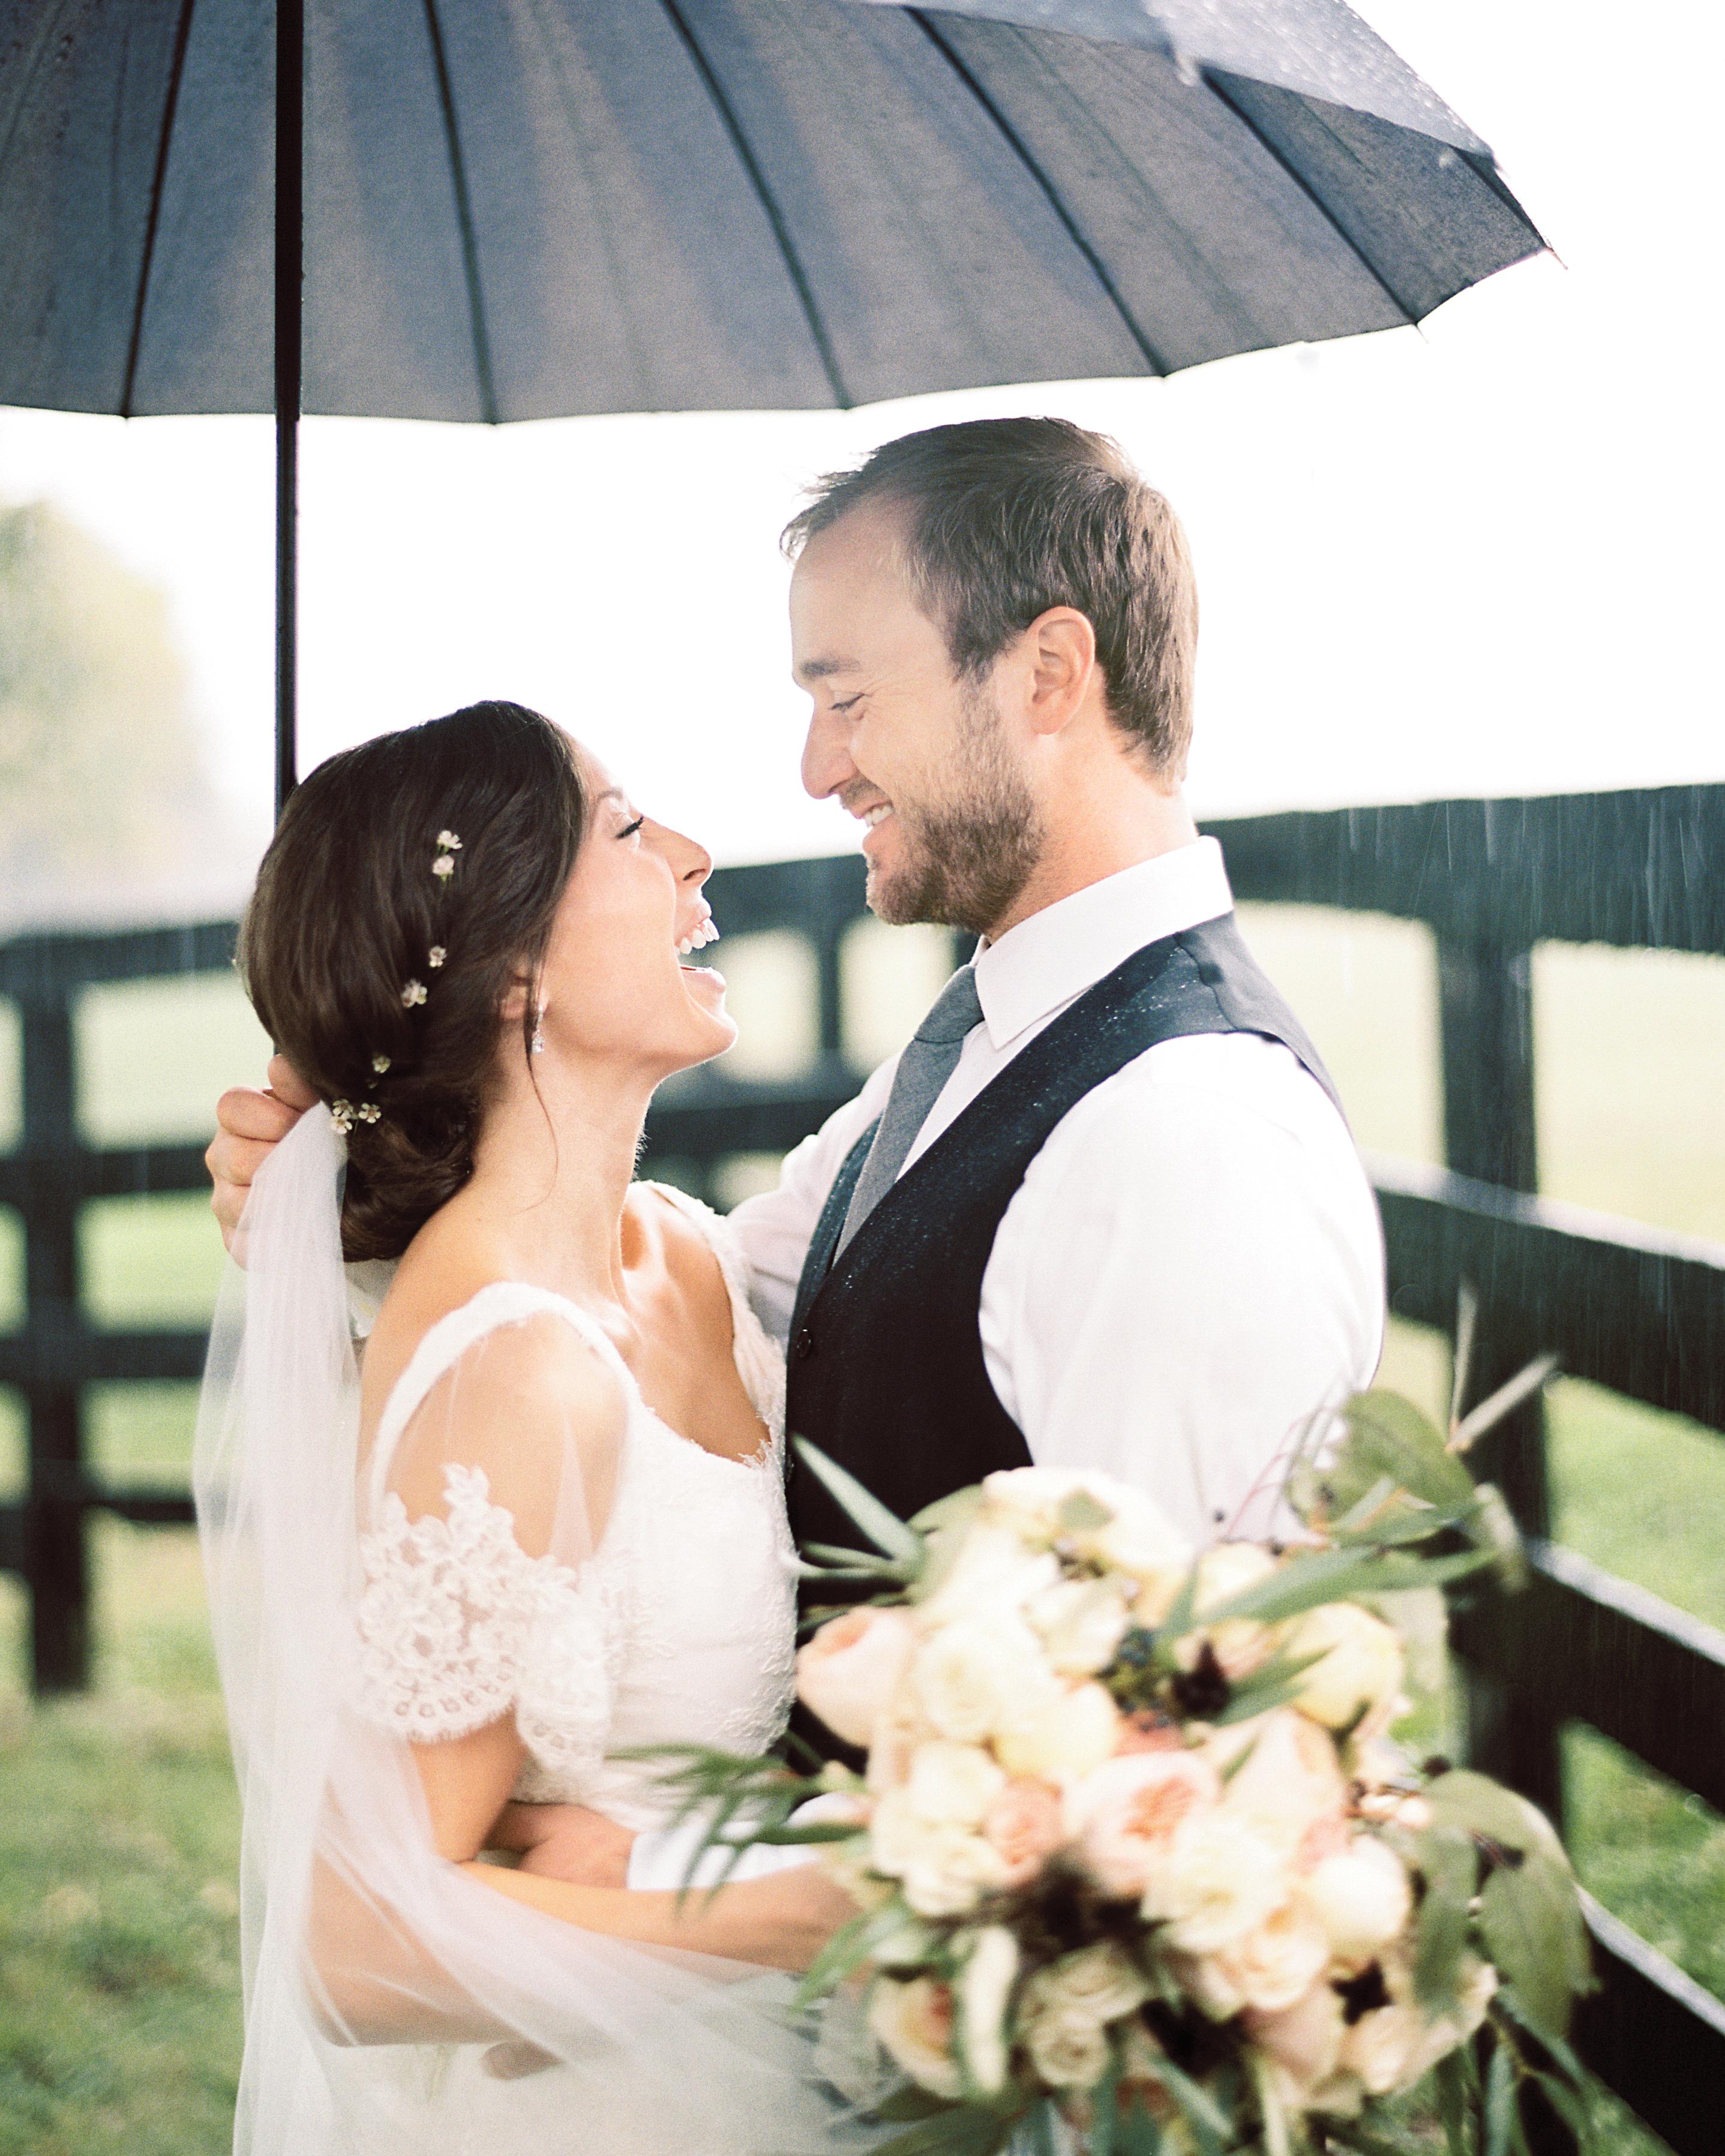 bride-groom-blaine-carson-wedding-178-mwds110873.jpg